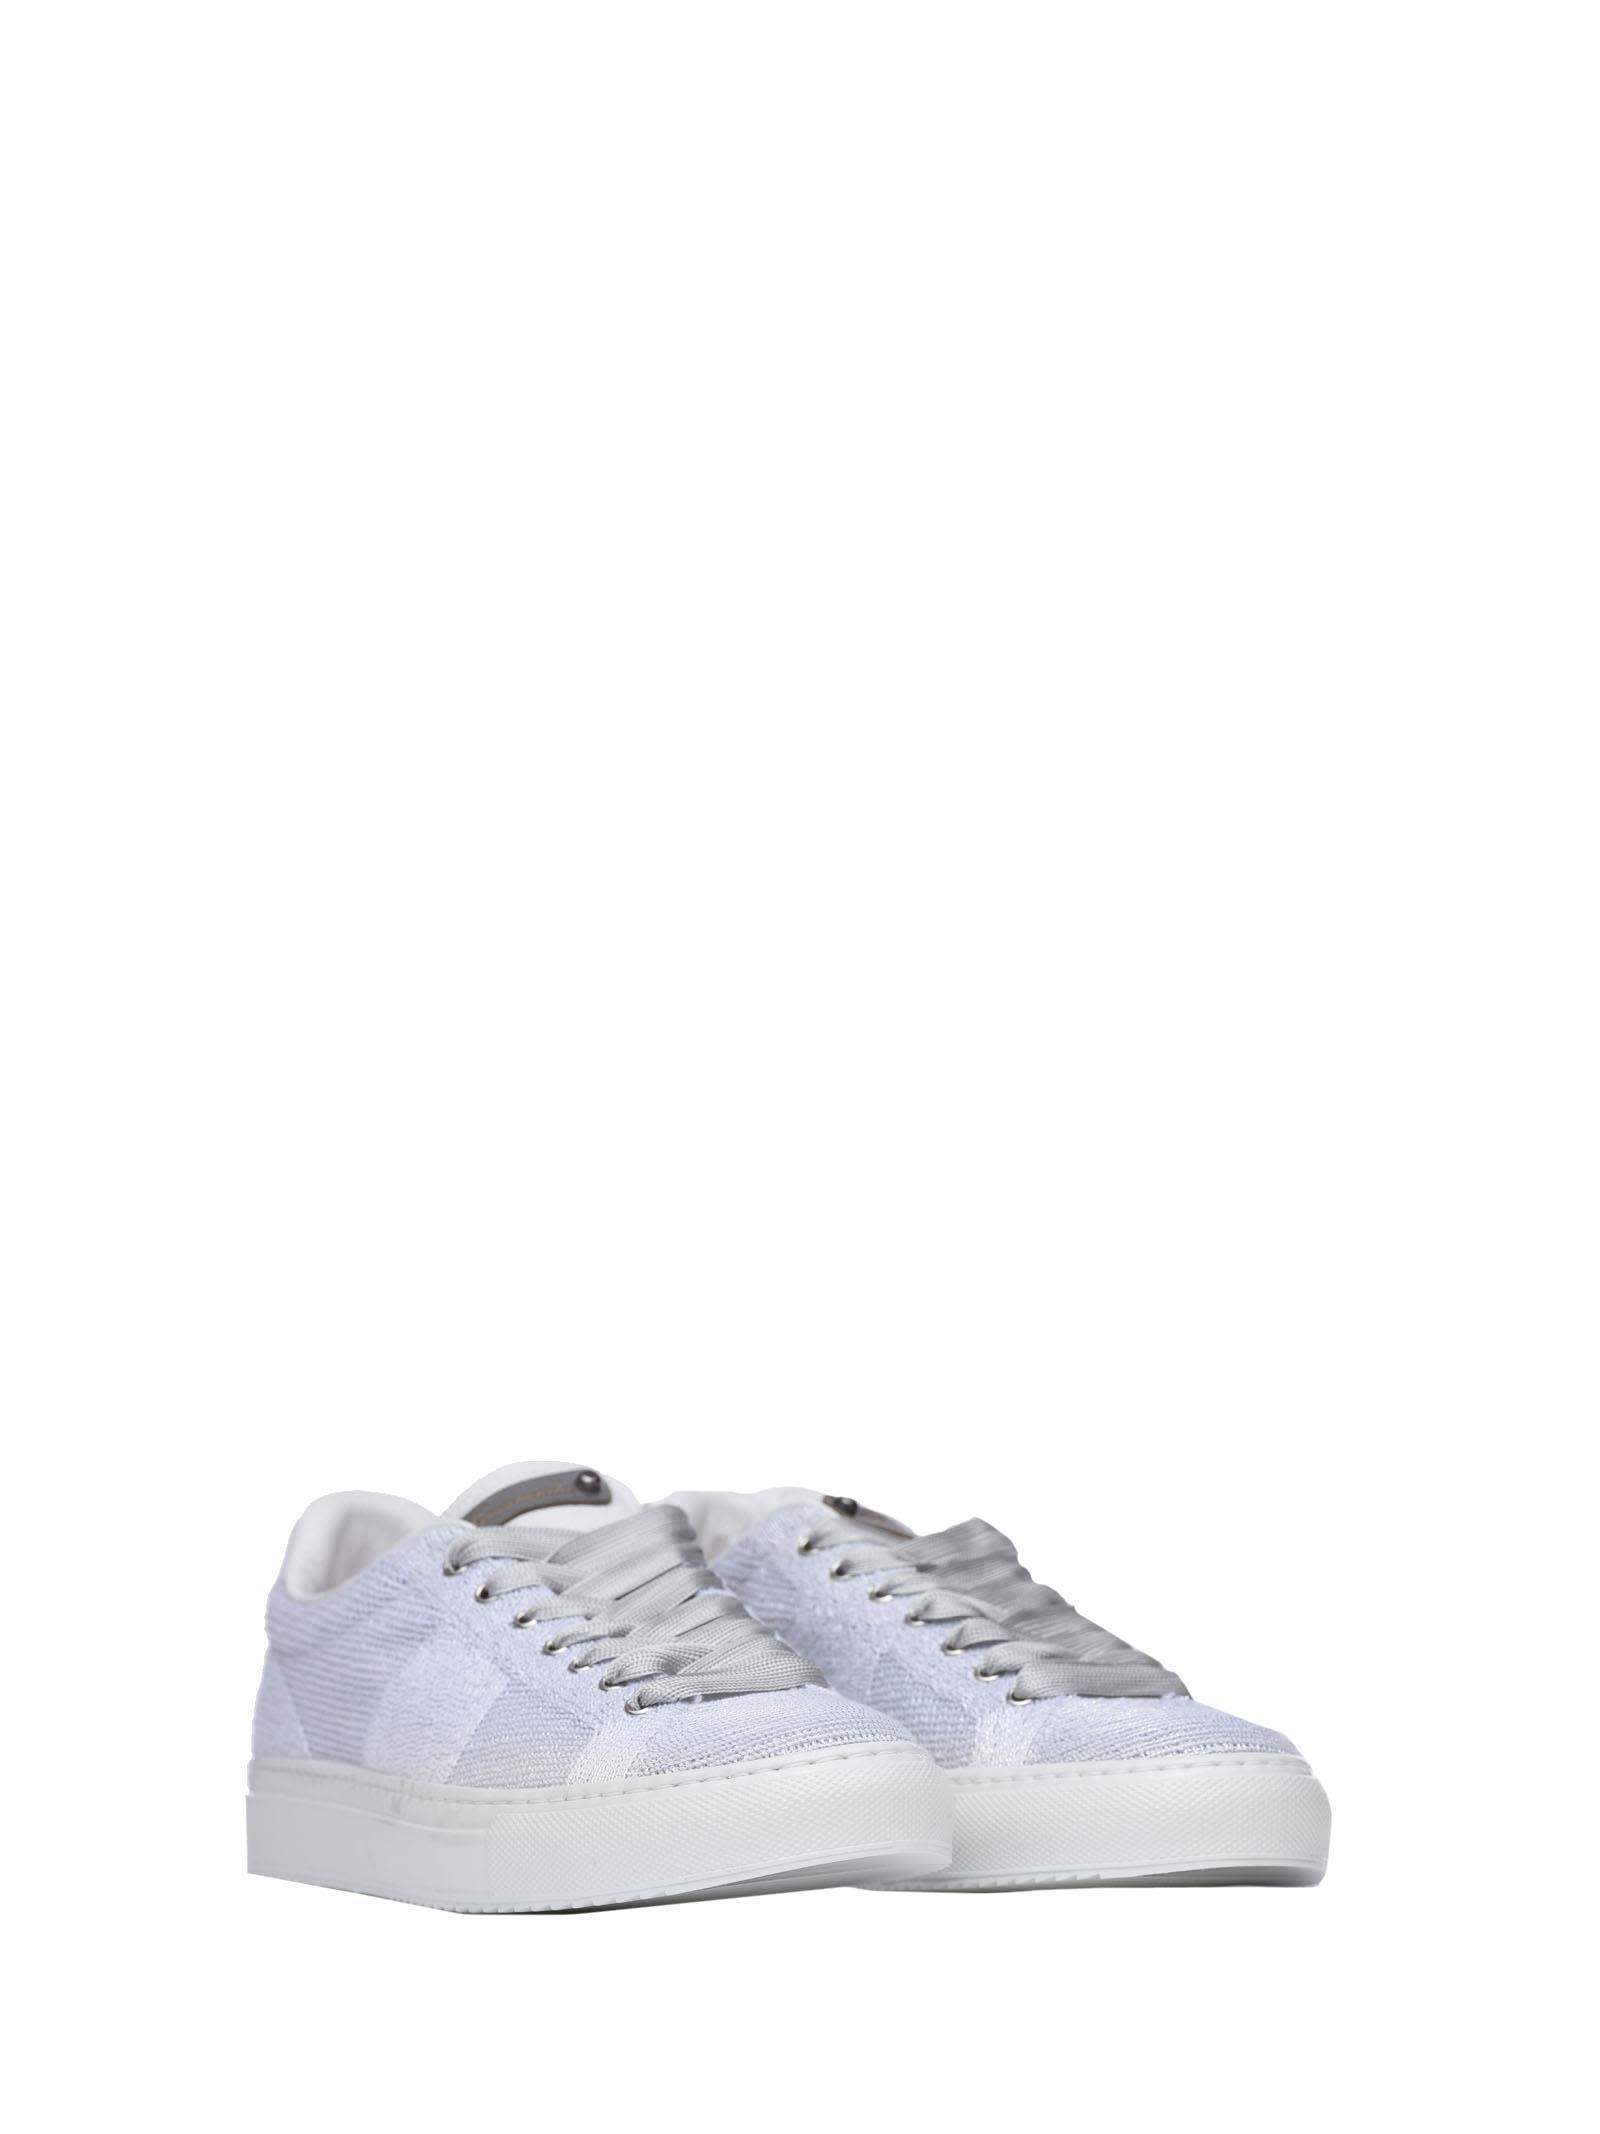 Barracuda - Barracuda Beatrice Silver Sneakers - SILVER, Women\'s ...